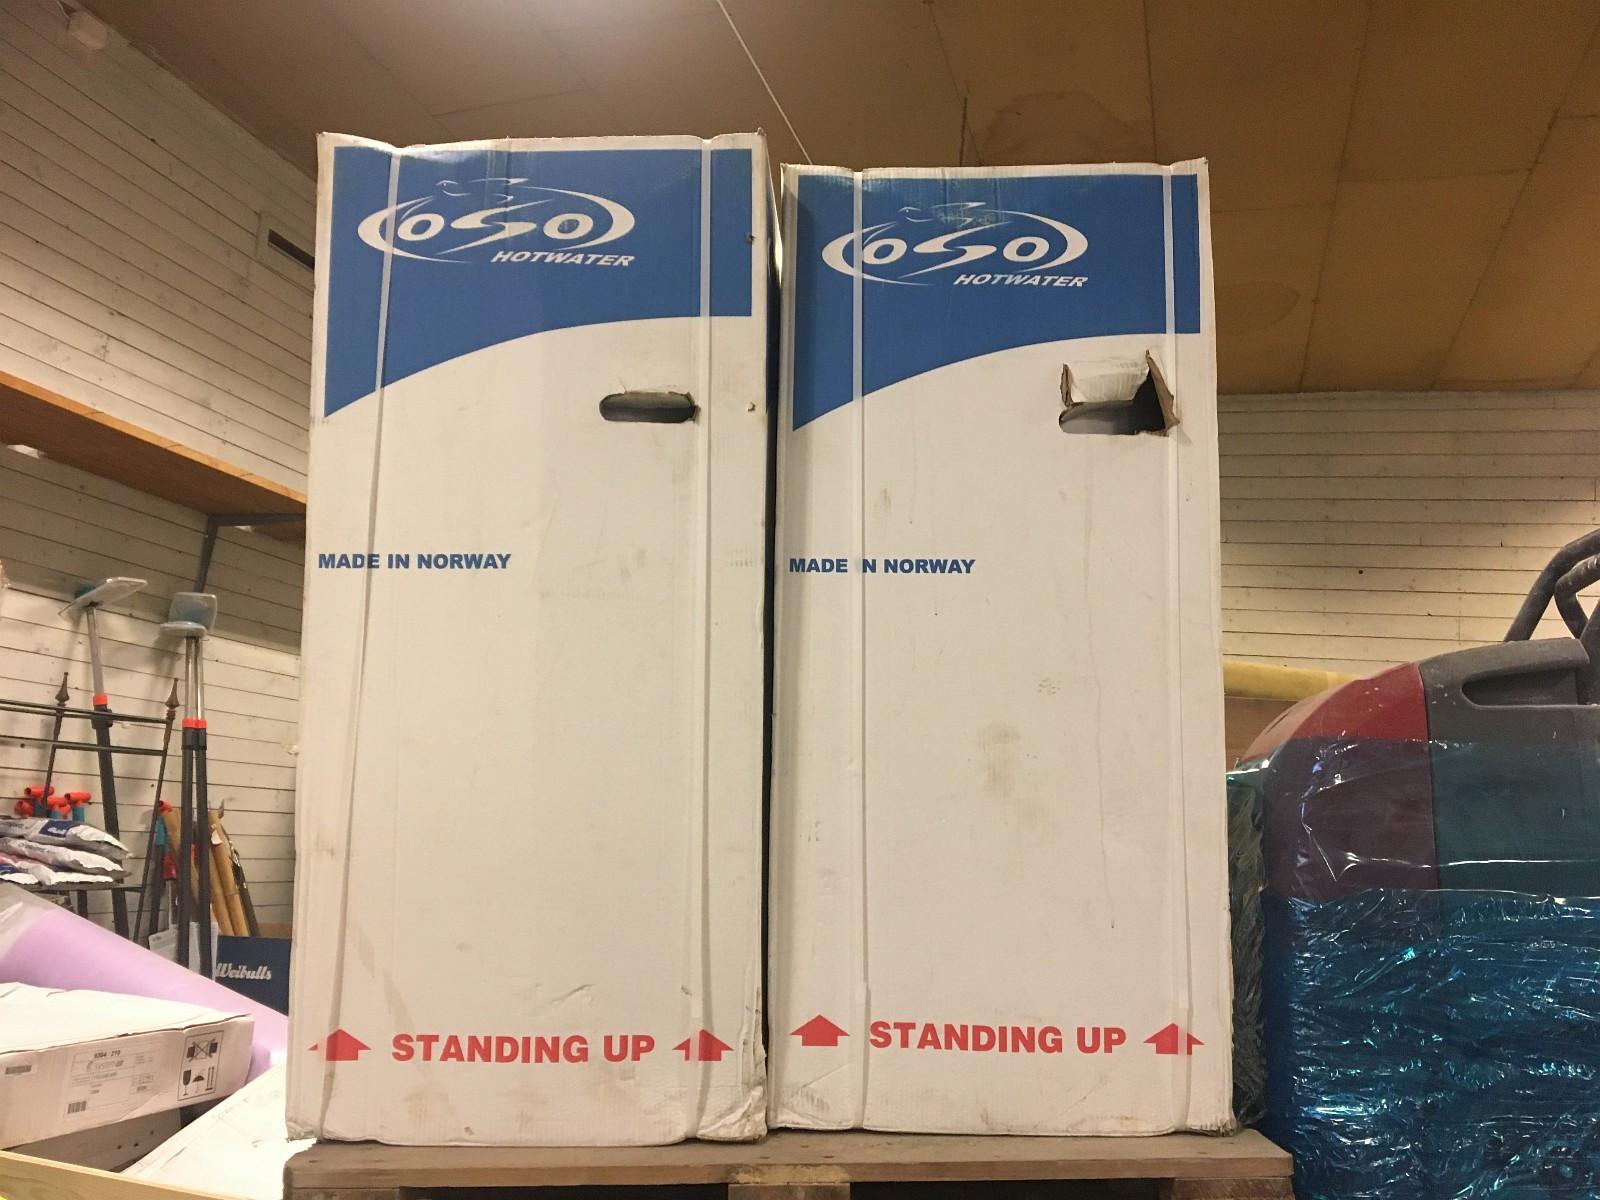 OSO LIGGENDE VARMTVANNSBEREDER Floorsmart RL 200L - 1,95 kW - Nesoddtangen  - Har liggende 2 stk OSO varmtvannsbereder Floorsmart RL 200L - 1,95 kW liggende beredere fra 2015, som er nye i eske. Selges for kr 4.500,- pr stk. NY PRIS KR 13.800,- - Nesoddtangen